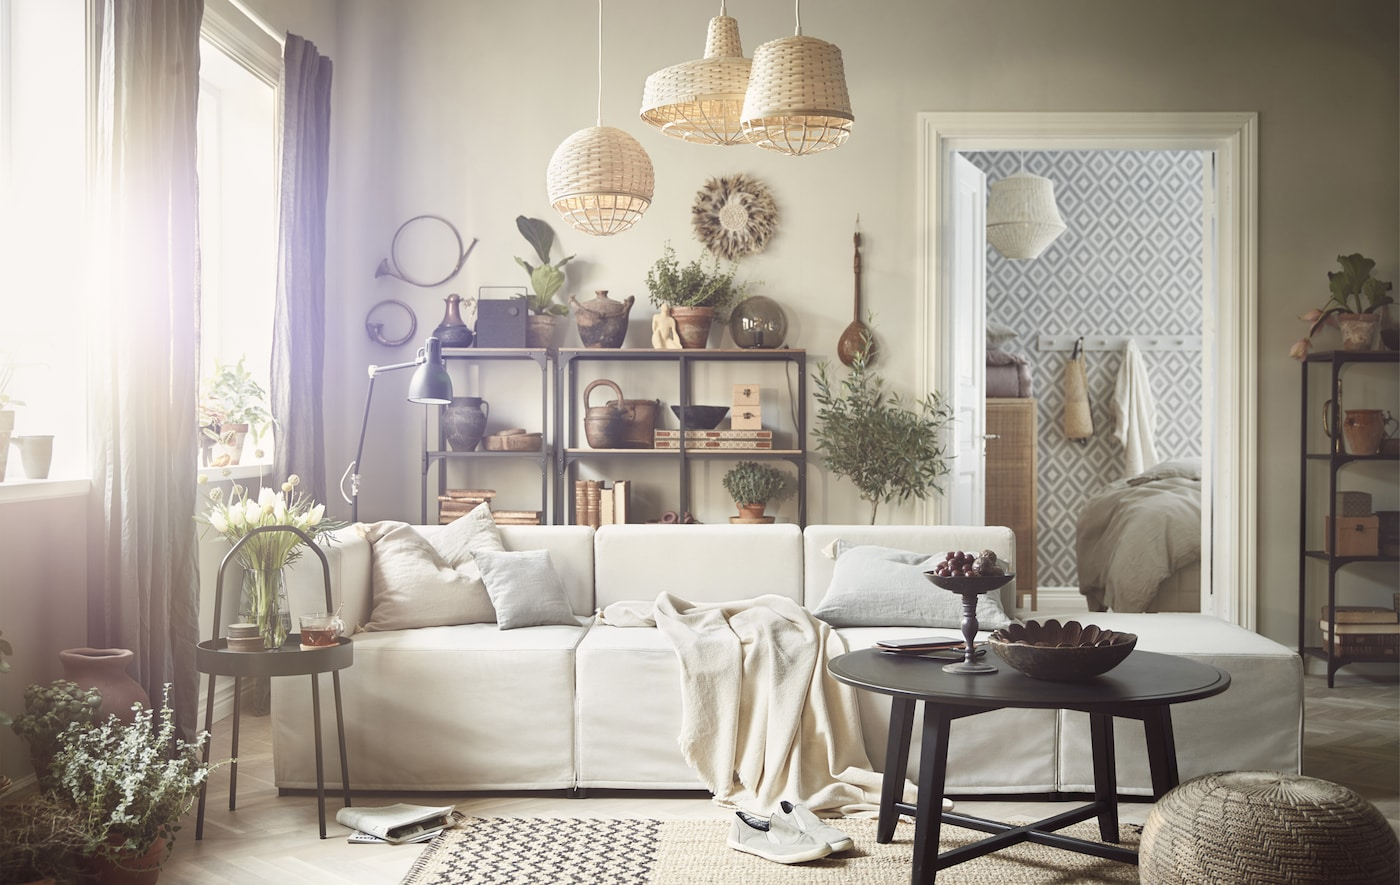 einrichtung mit naturmaterialien ikea ikea. Black Bedroom Furniture Sets. Home Design Ideas